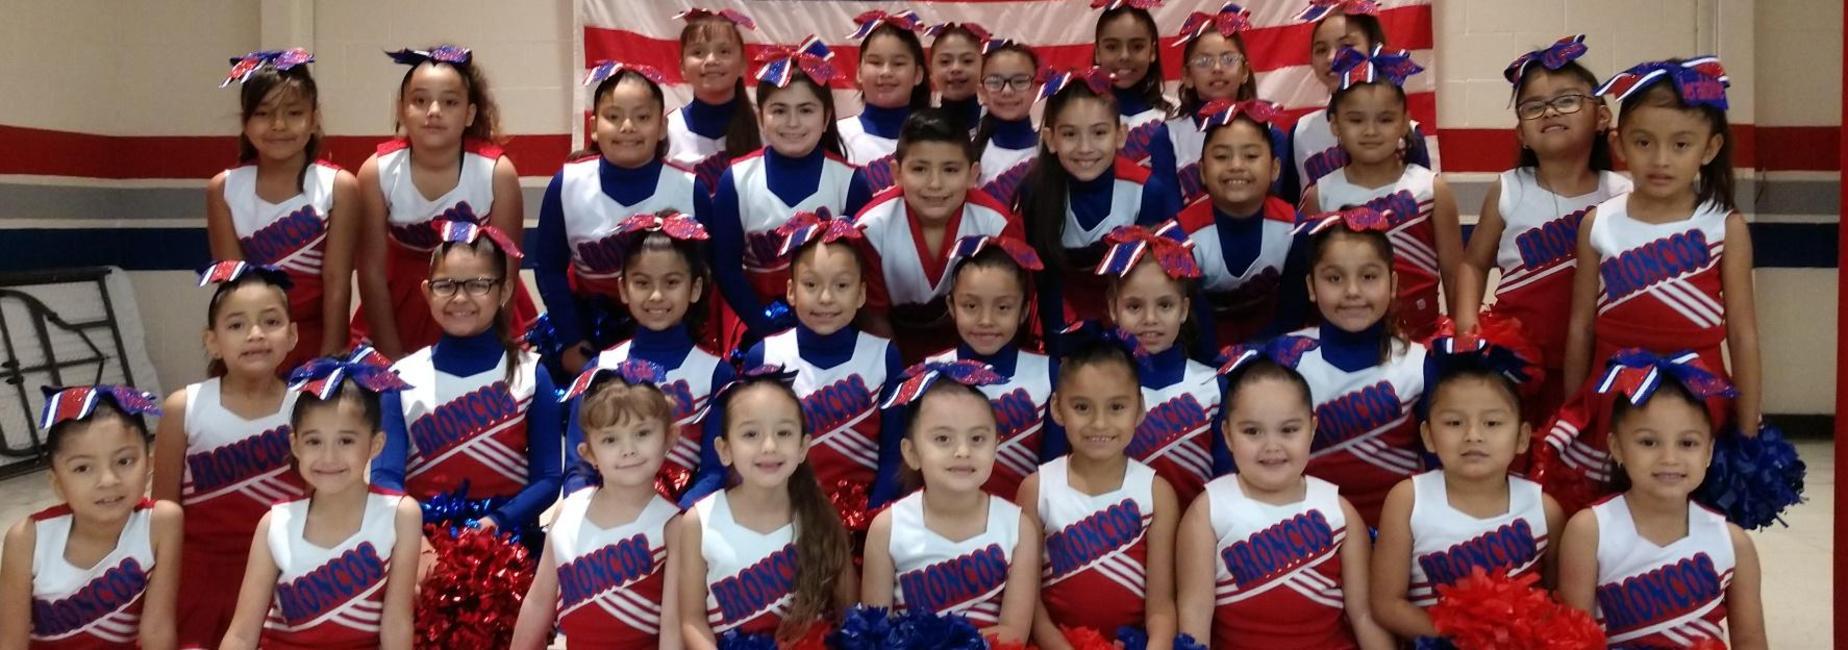 Roosevelt Cheerleaders